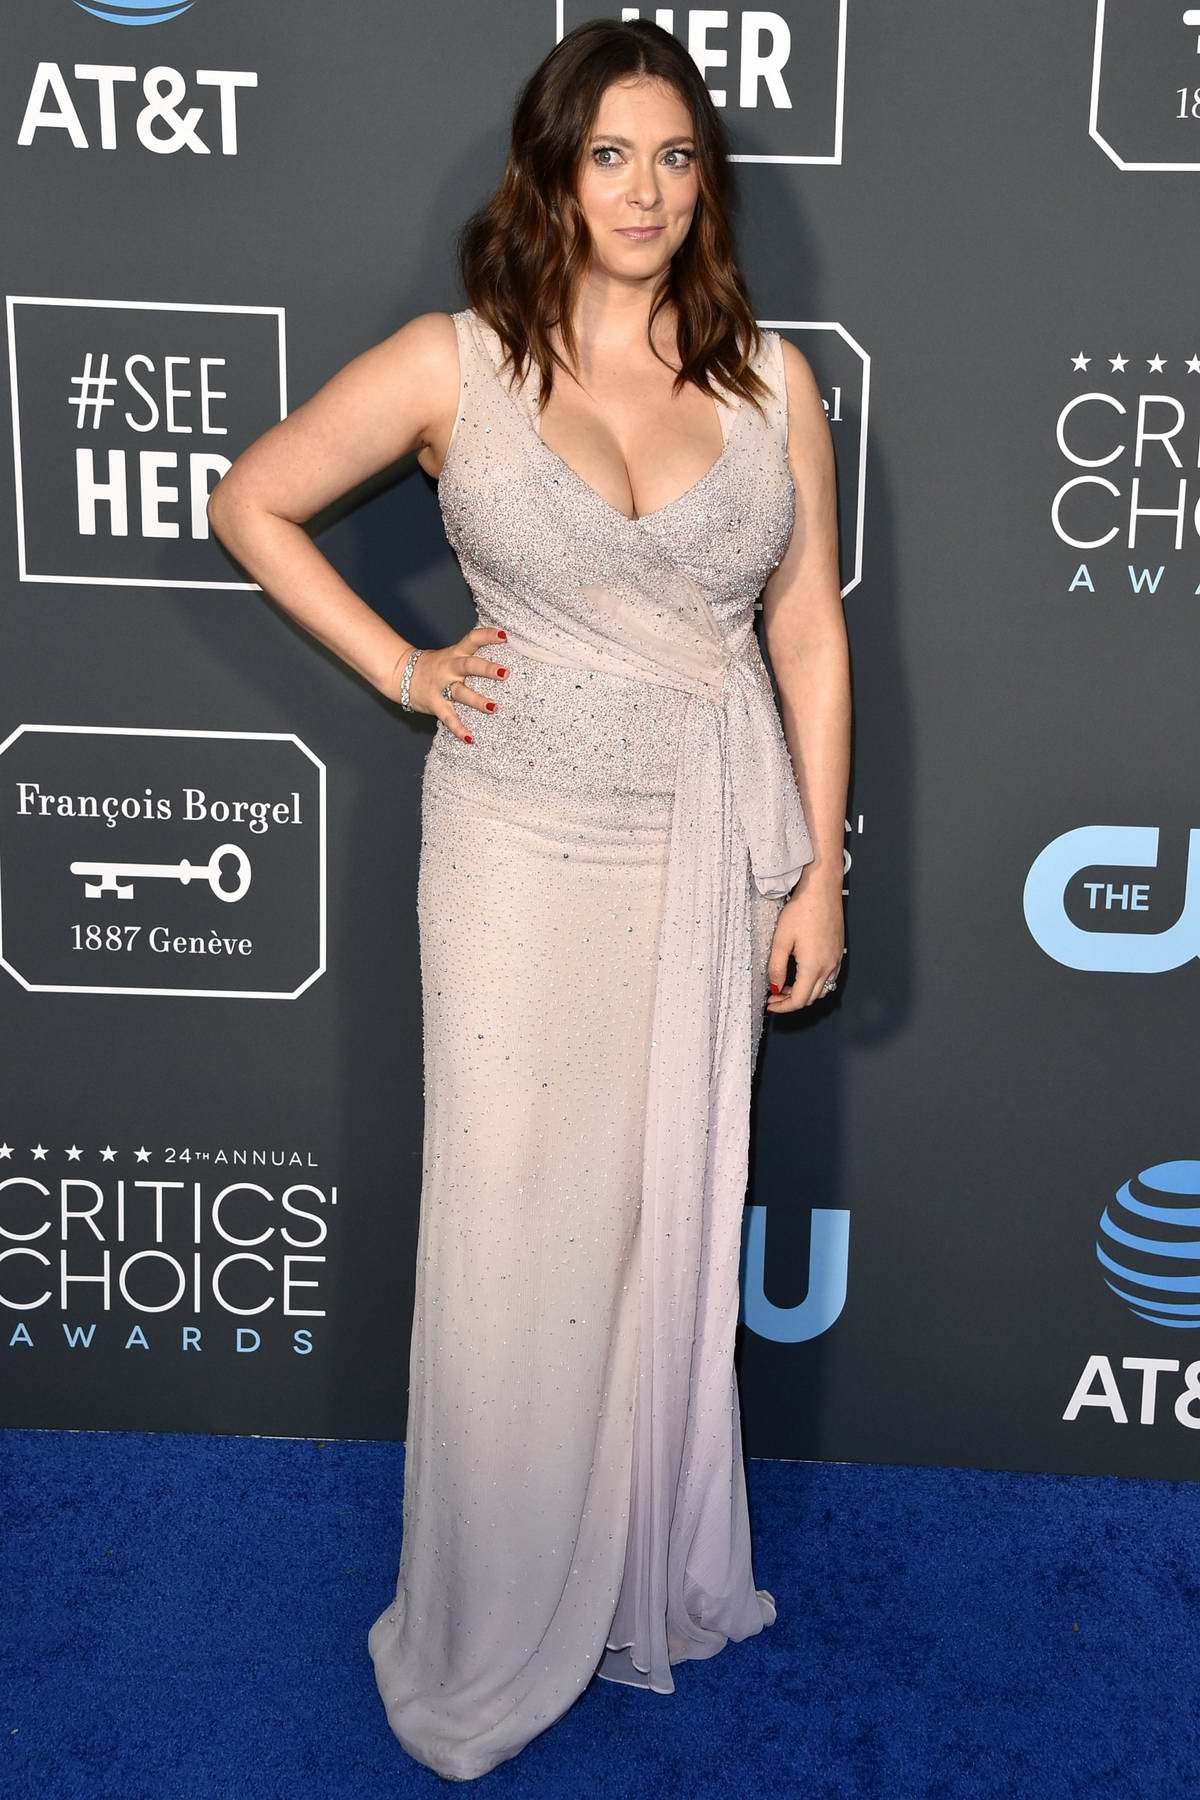 Rachel Bloom attends the 24th Annual Critics' Choice Awards at Barker Hangar in Santa Monica, California